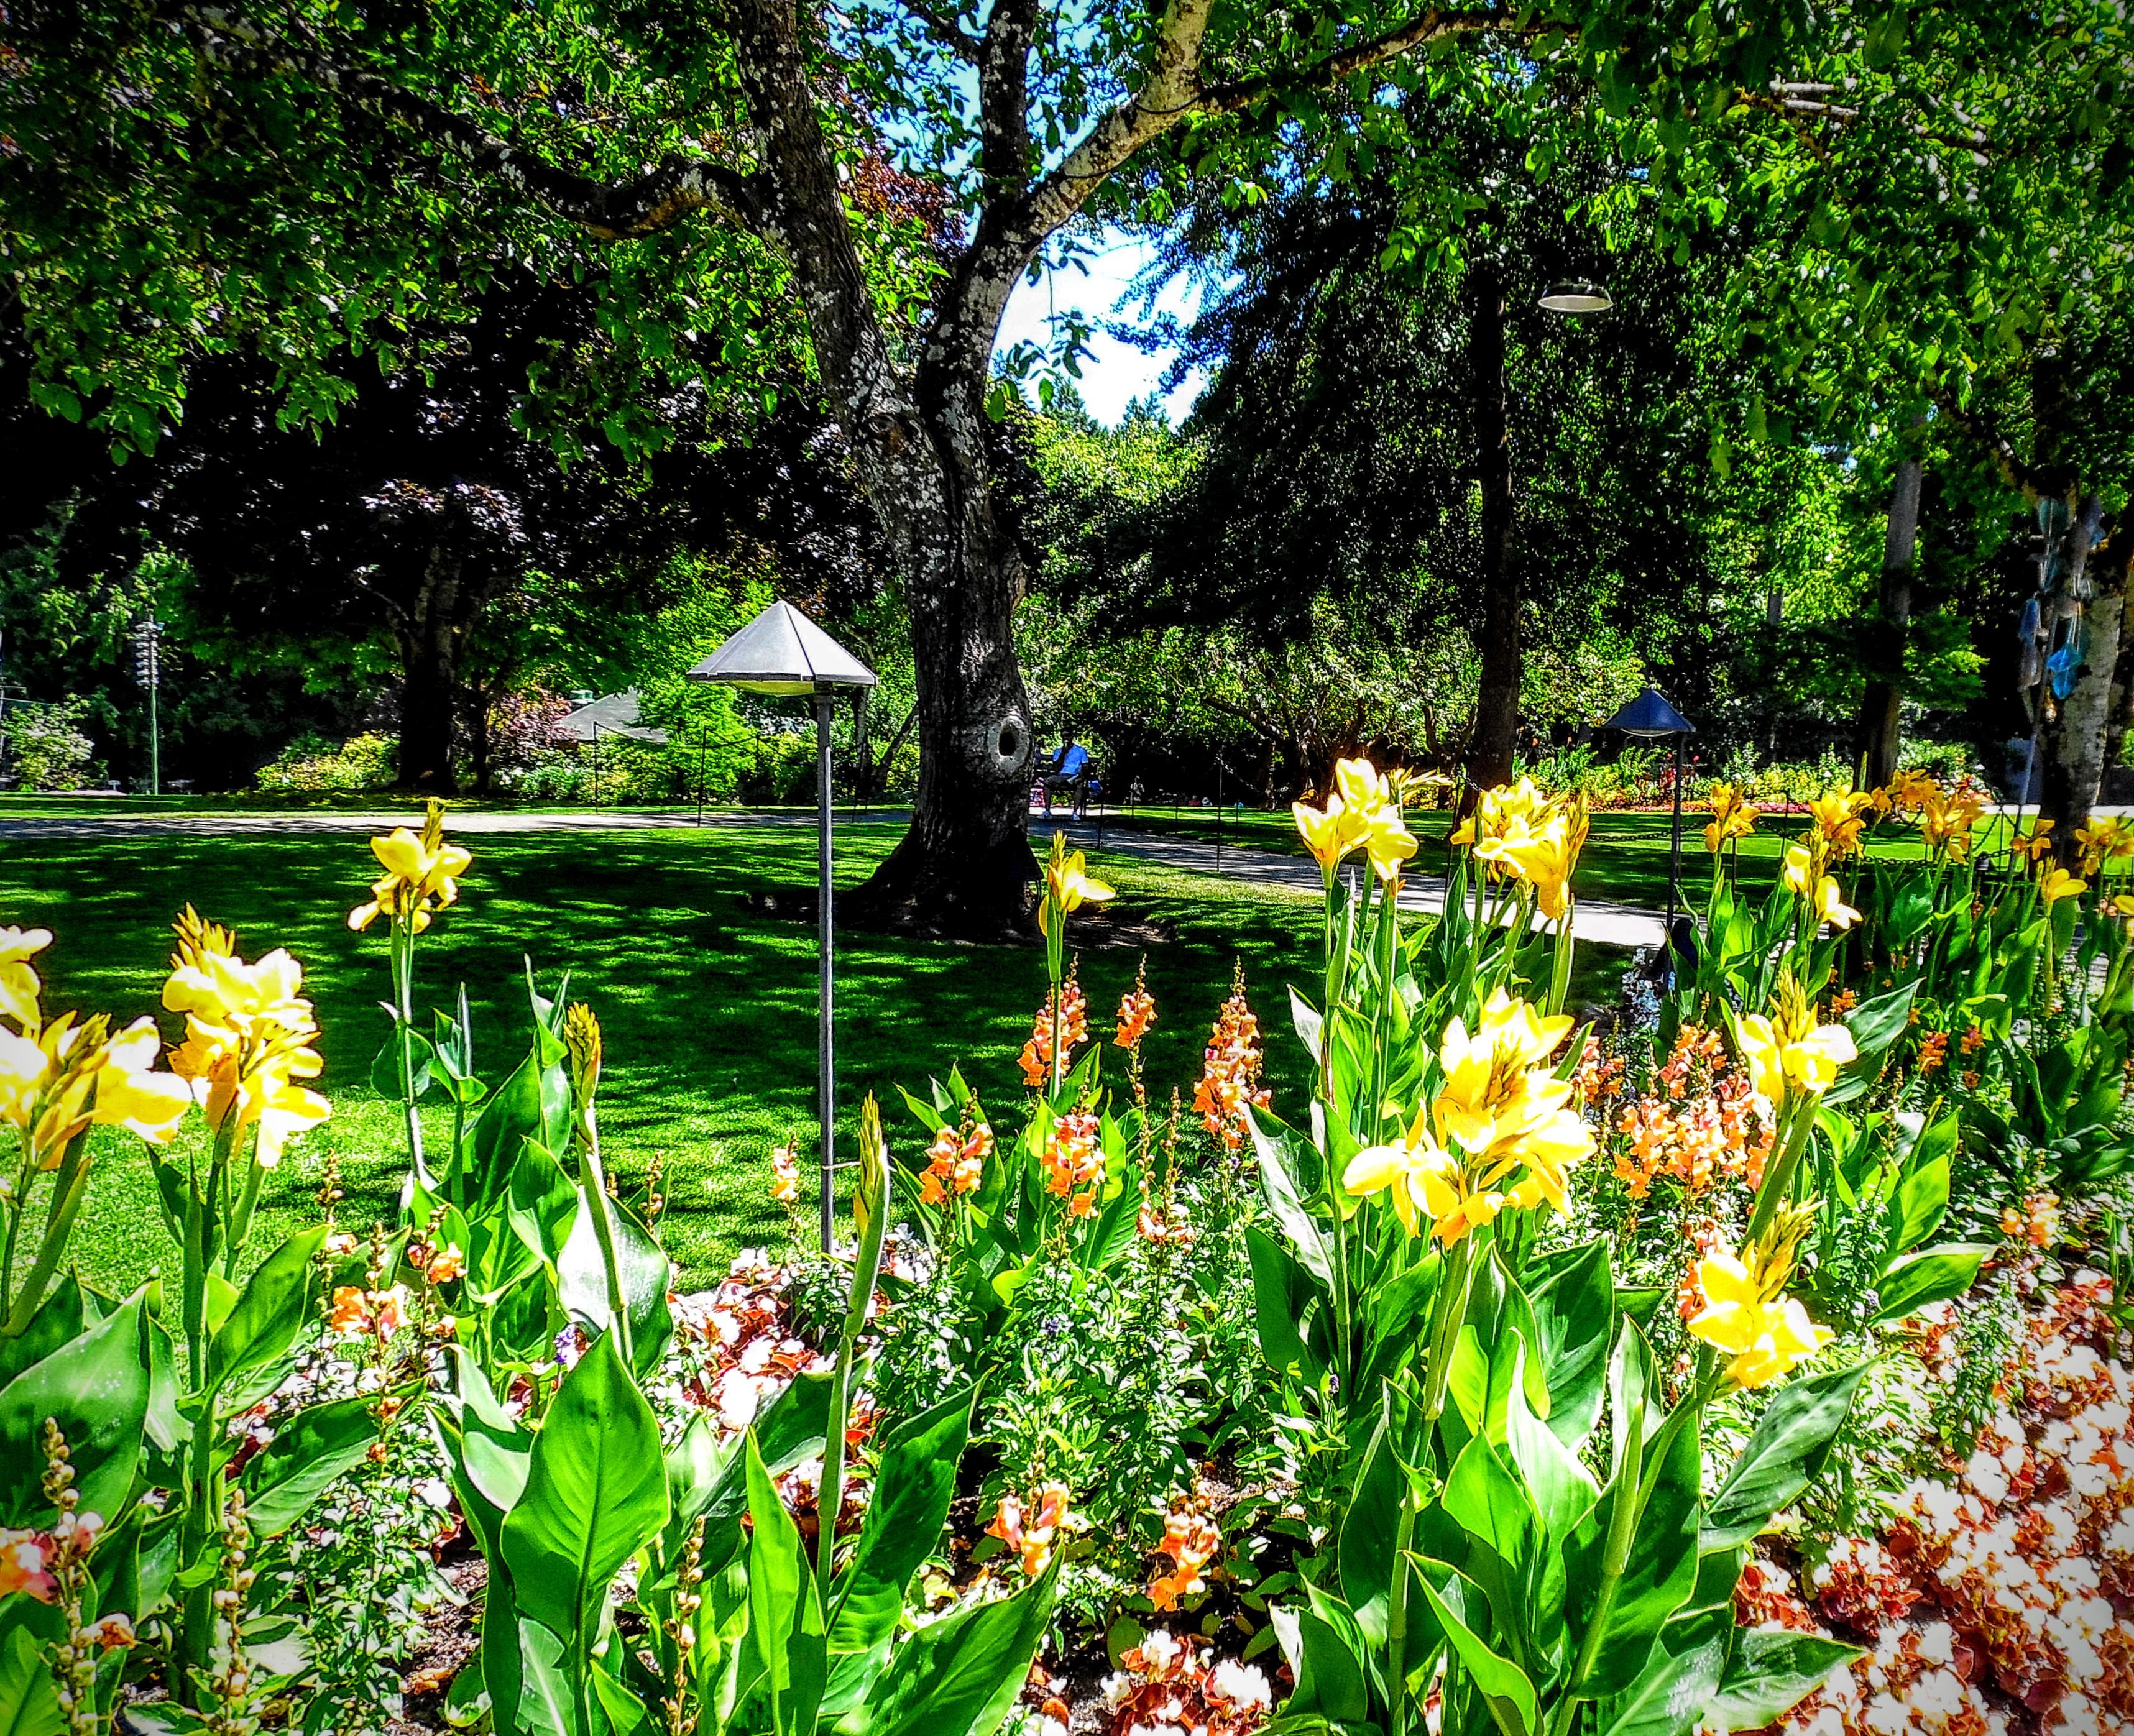 Filebutchart gardens victoria british columbia canada filebutchart gardens victoria british columbia canada 28573353434g altavistaventures Choice Image